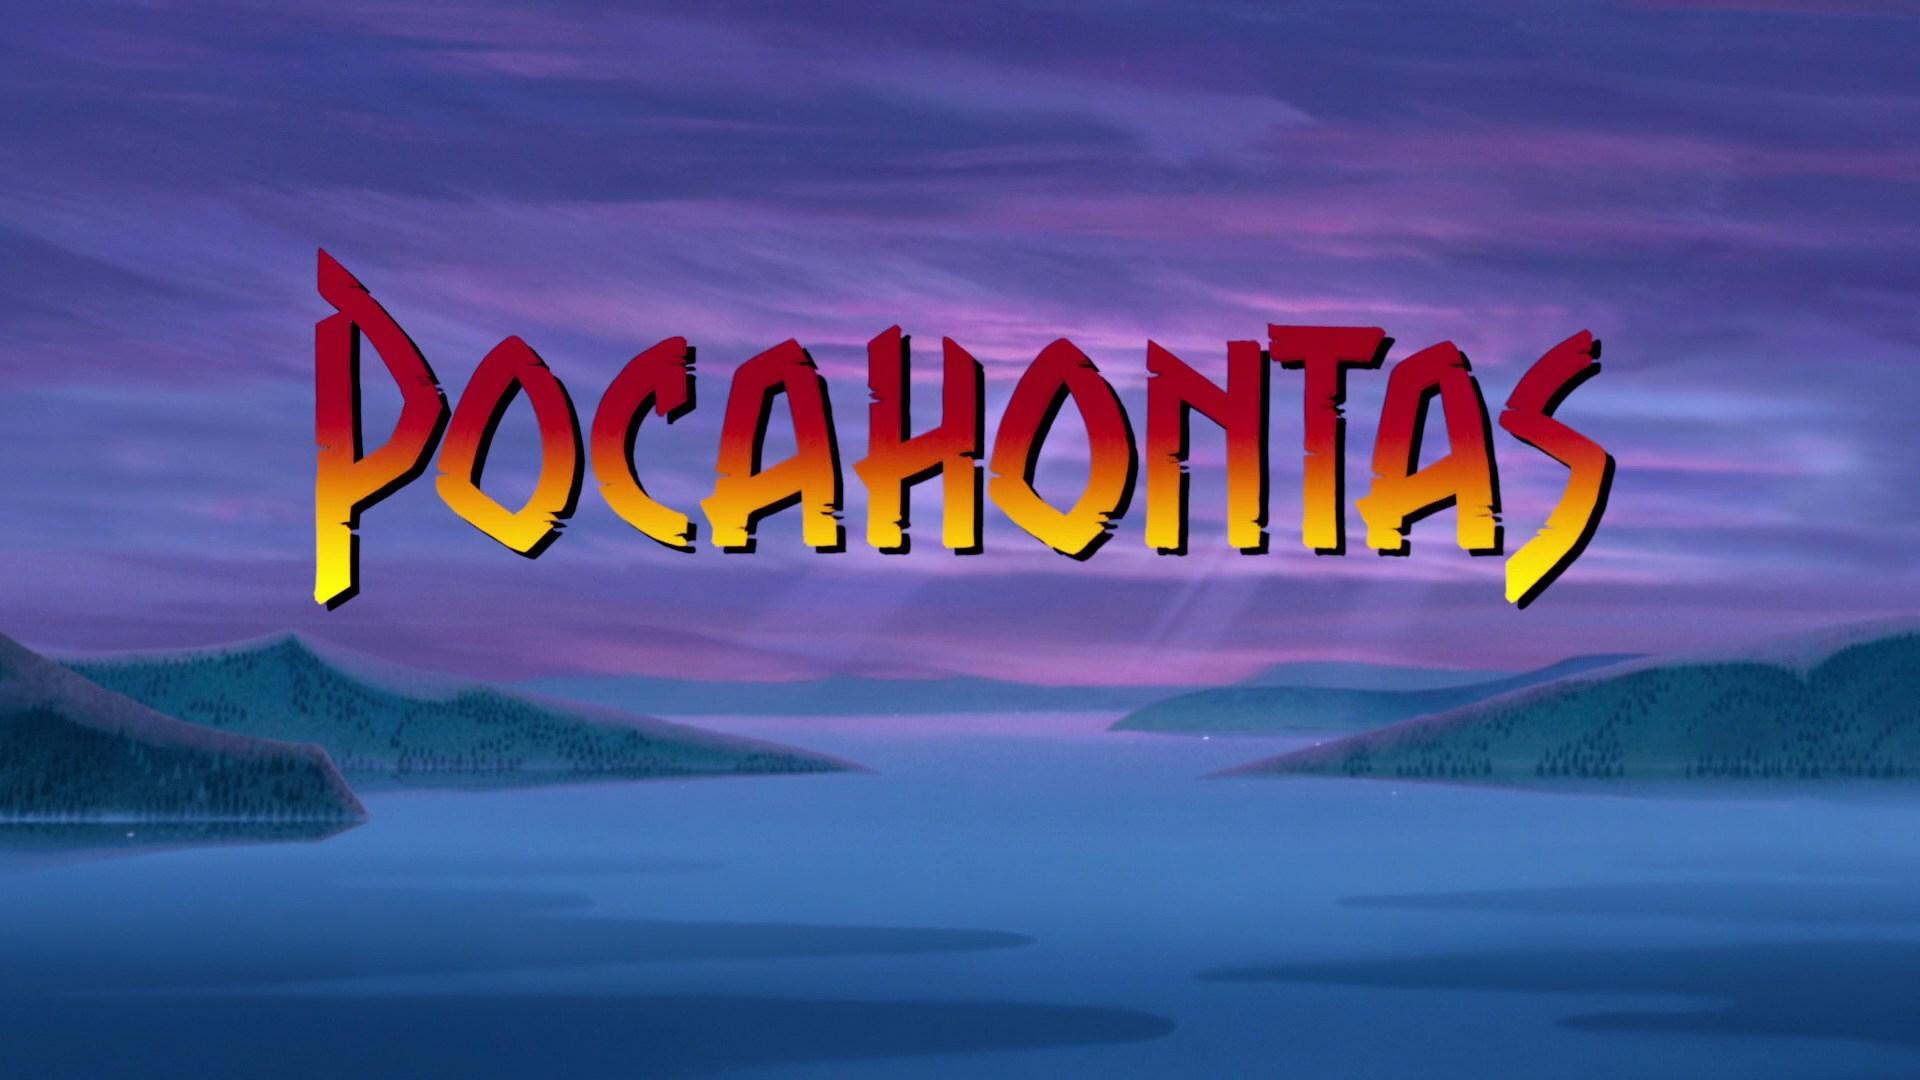 Pocahontas (Disney Svenska) (@charlesj6ibbs) Cover Image